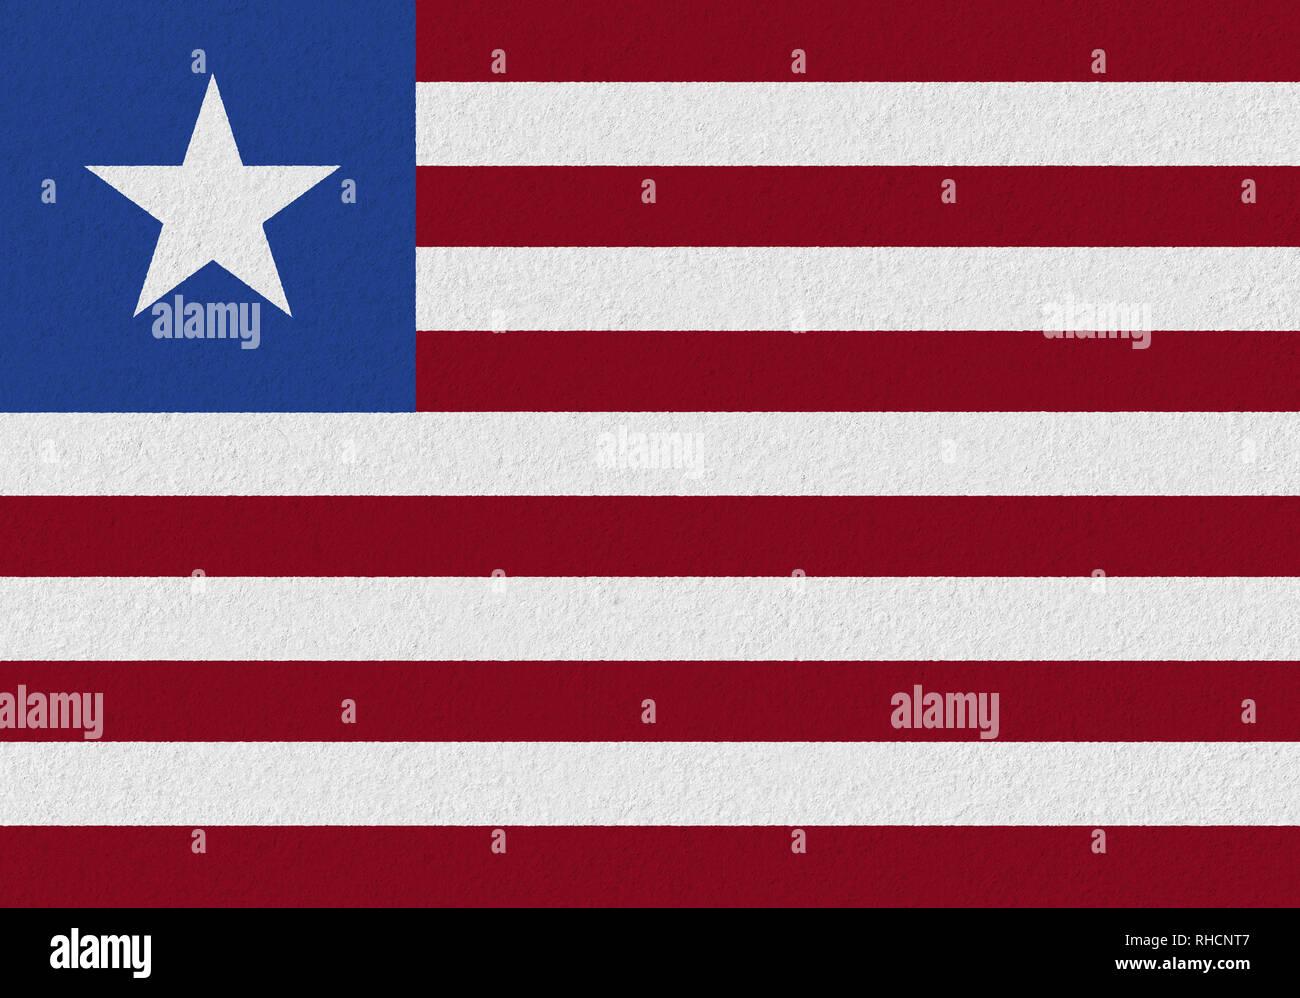 Liberia paper flag. Patriotic background. National flag of Liberia - Stock Image